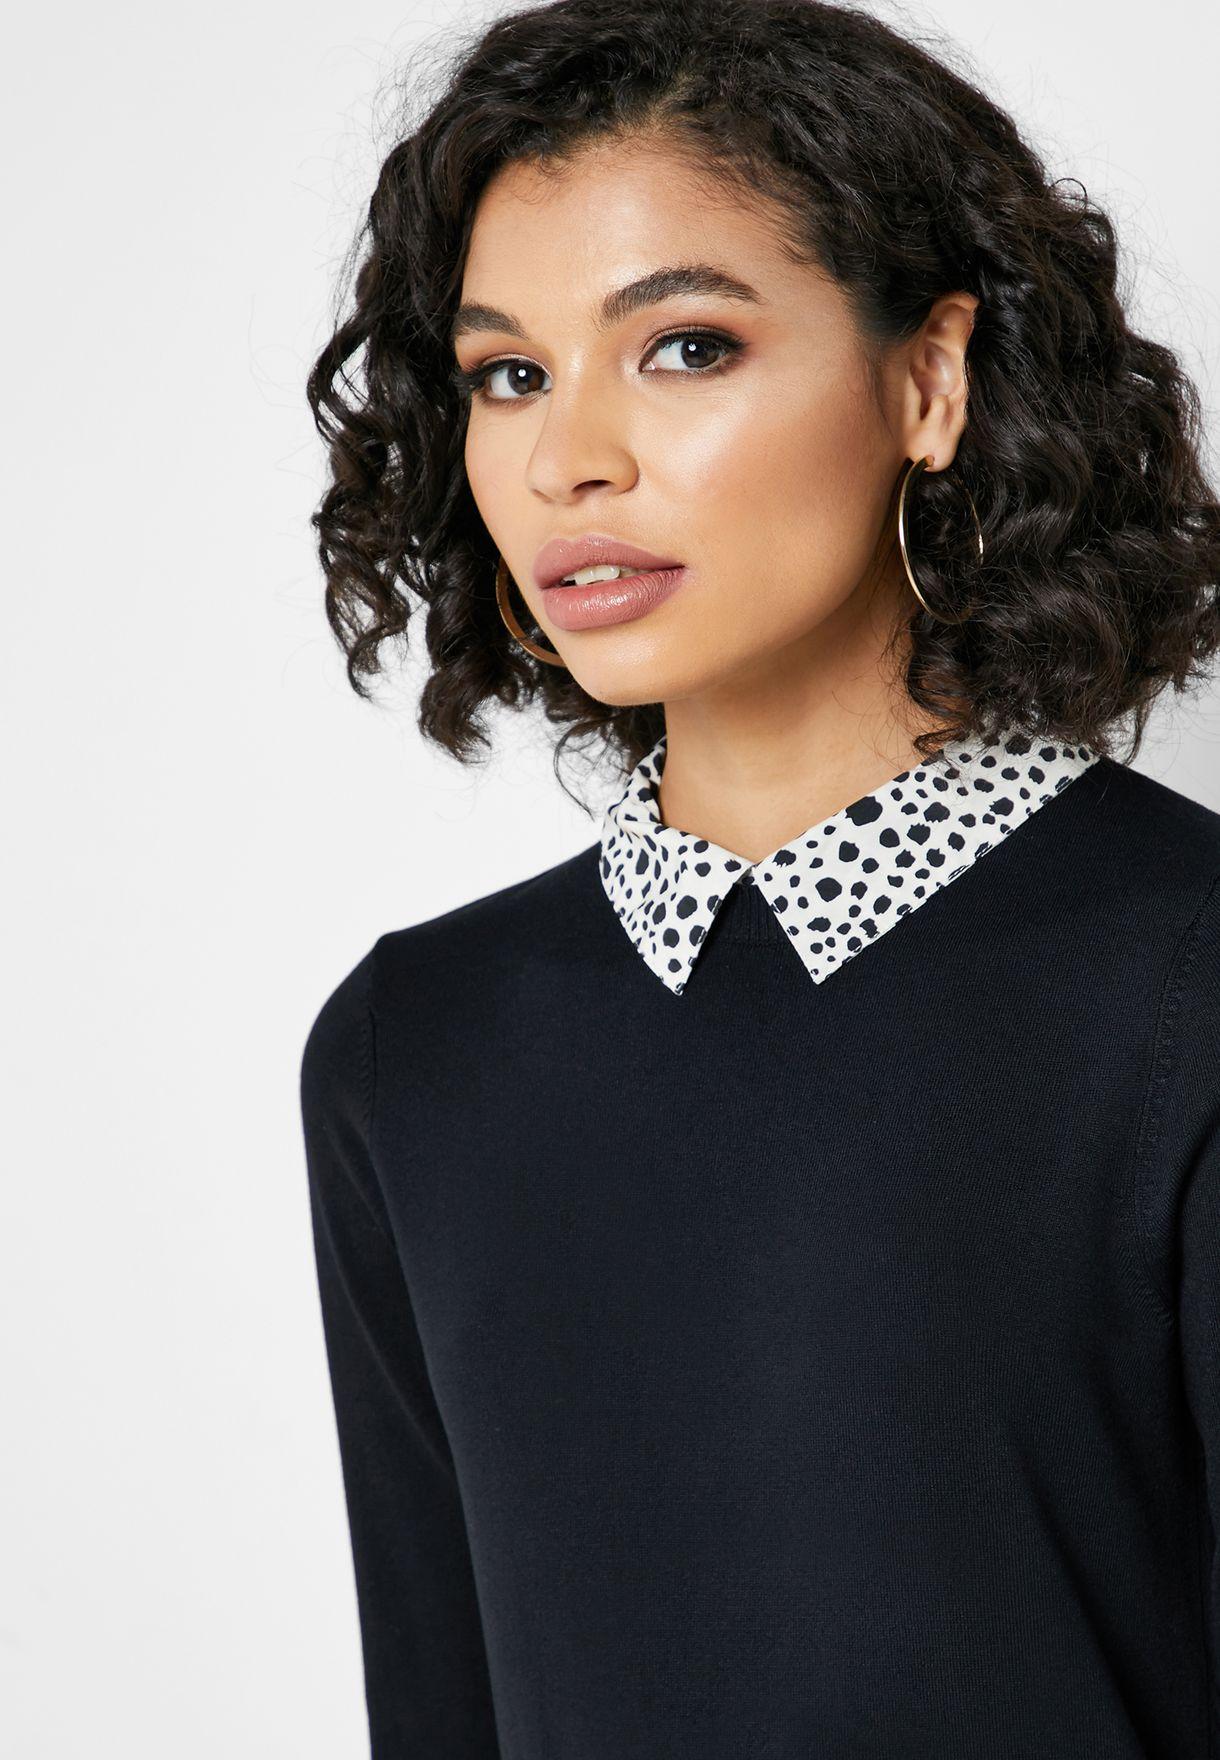 Printed Collar 2 In 1 Top